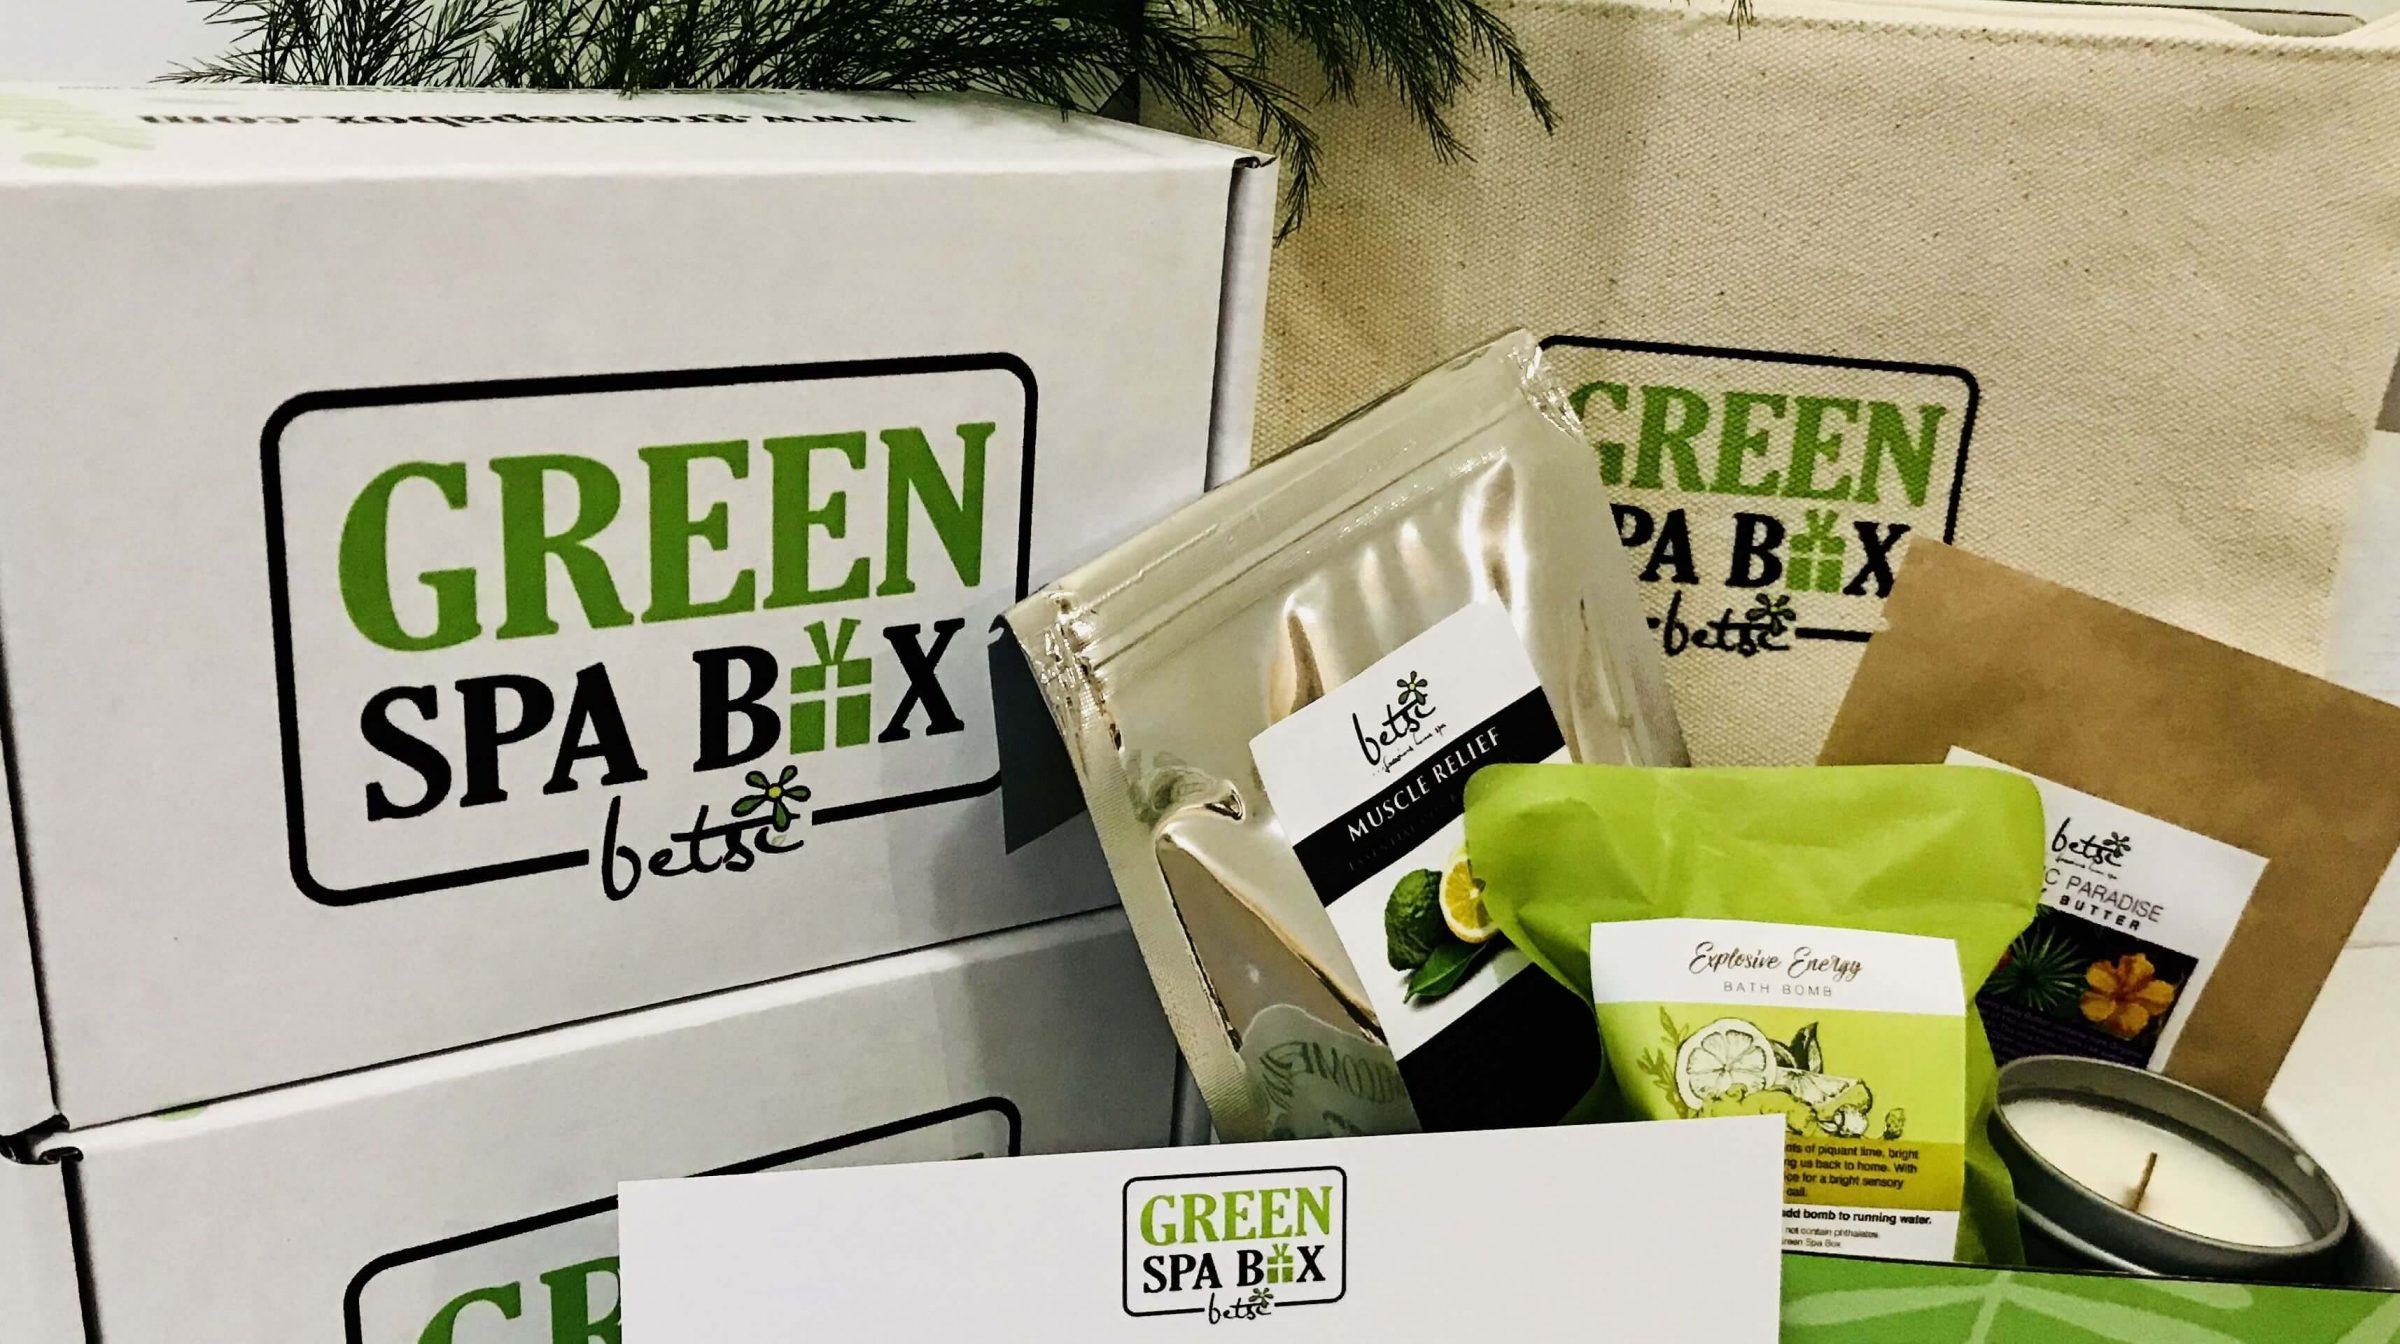 Green Spa Box